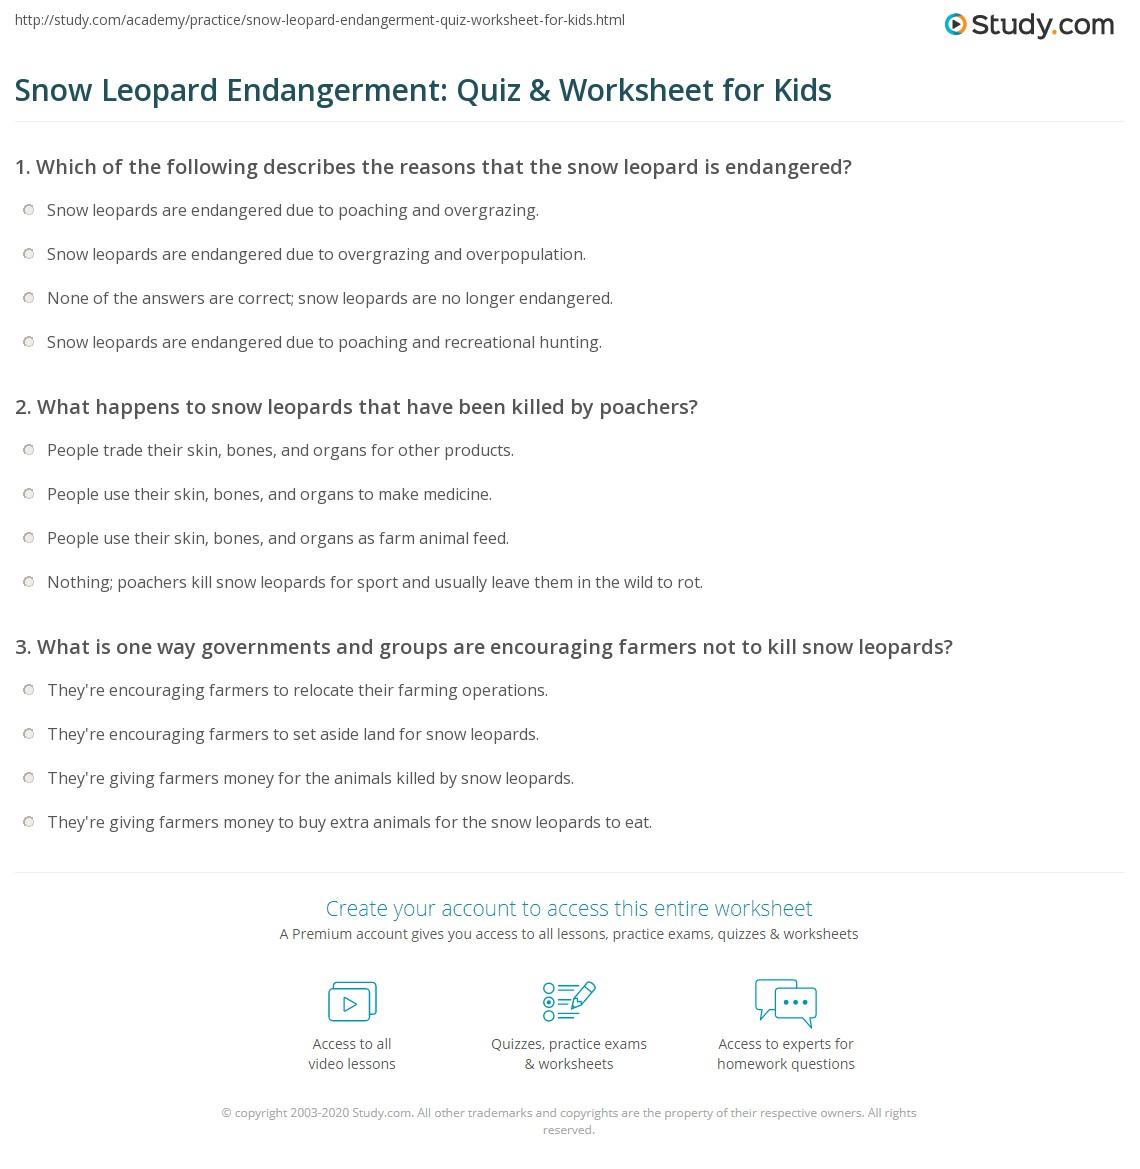 Snow Leopard Endangerment Quiz Amp Worksheet For Kids